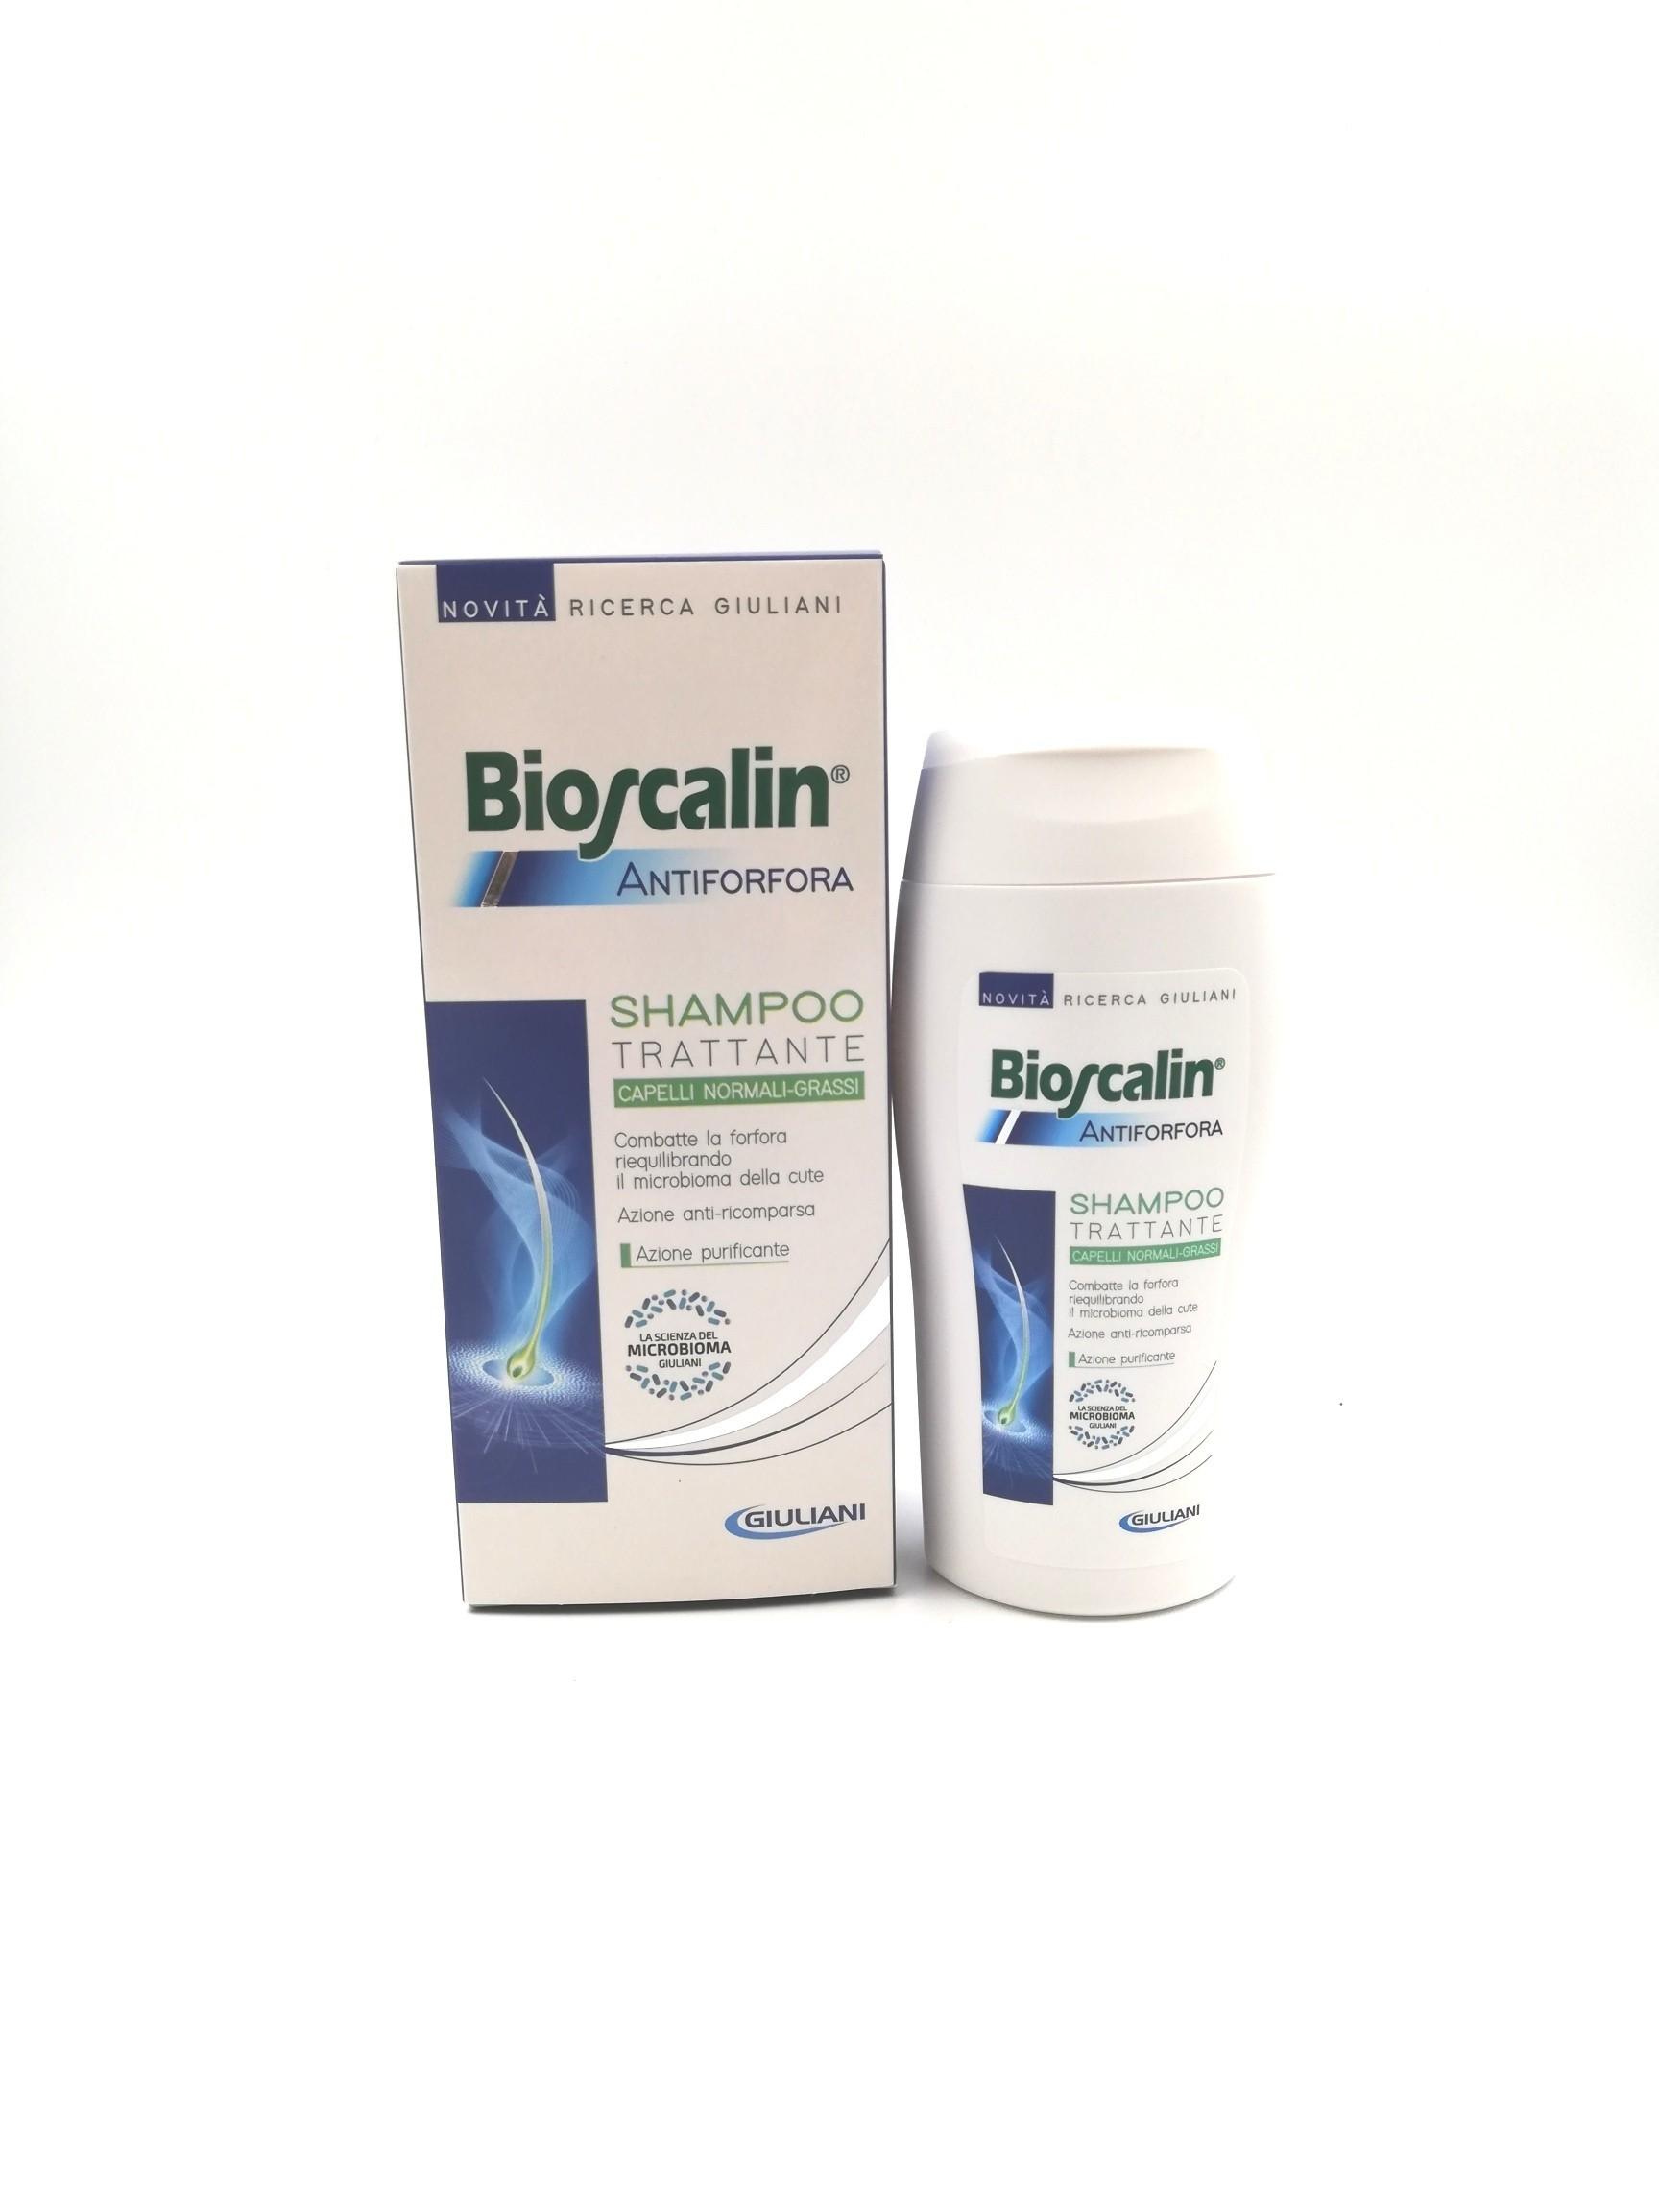 Bioscalin shampoo antiforfora normali-grassi 200ml